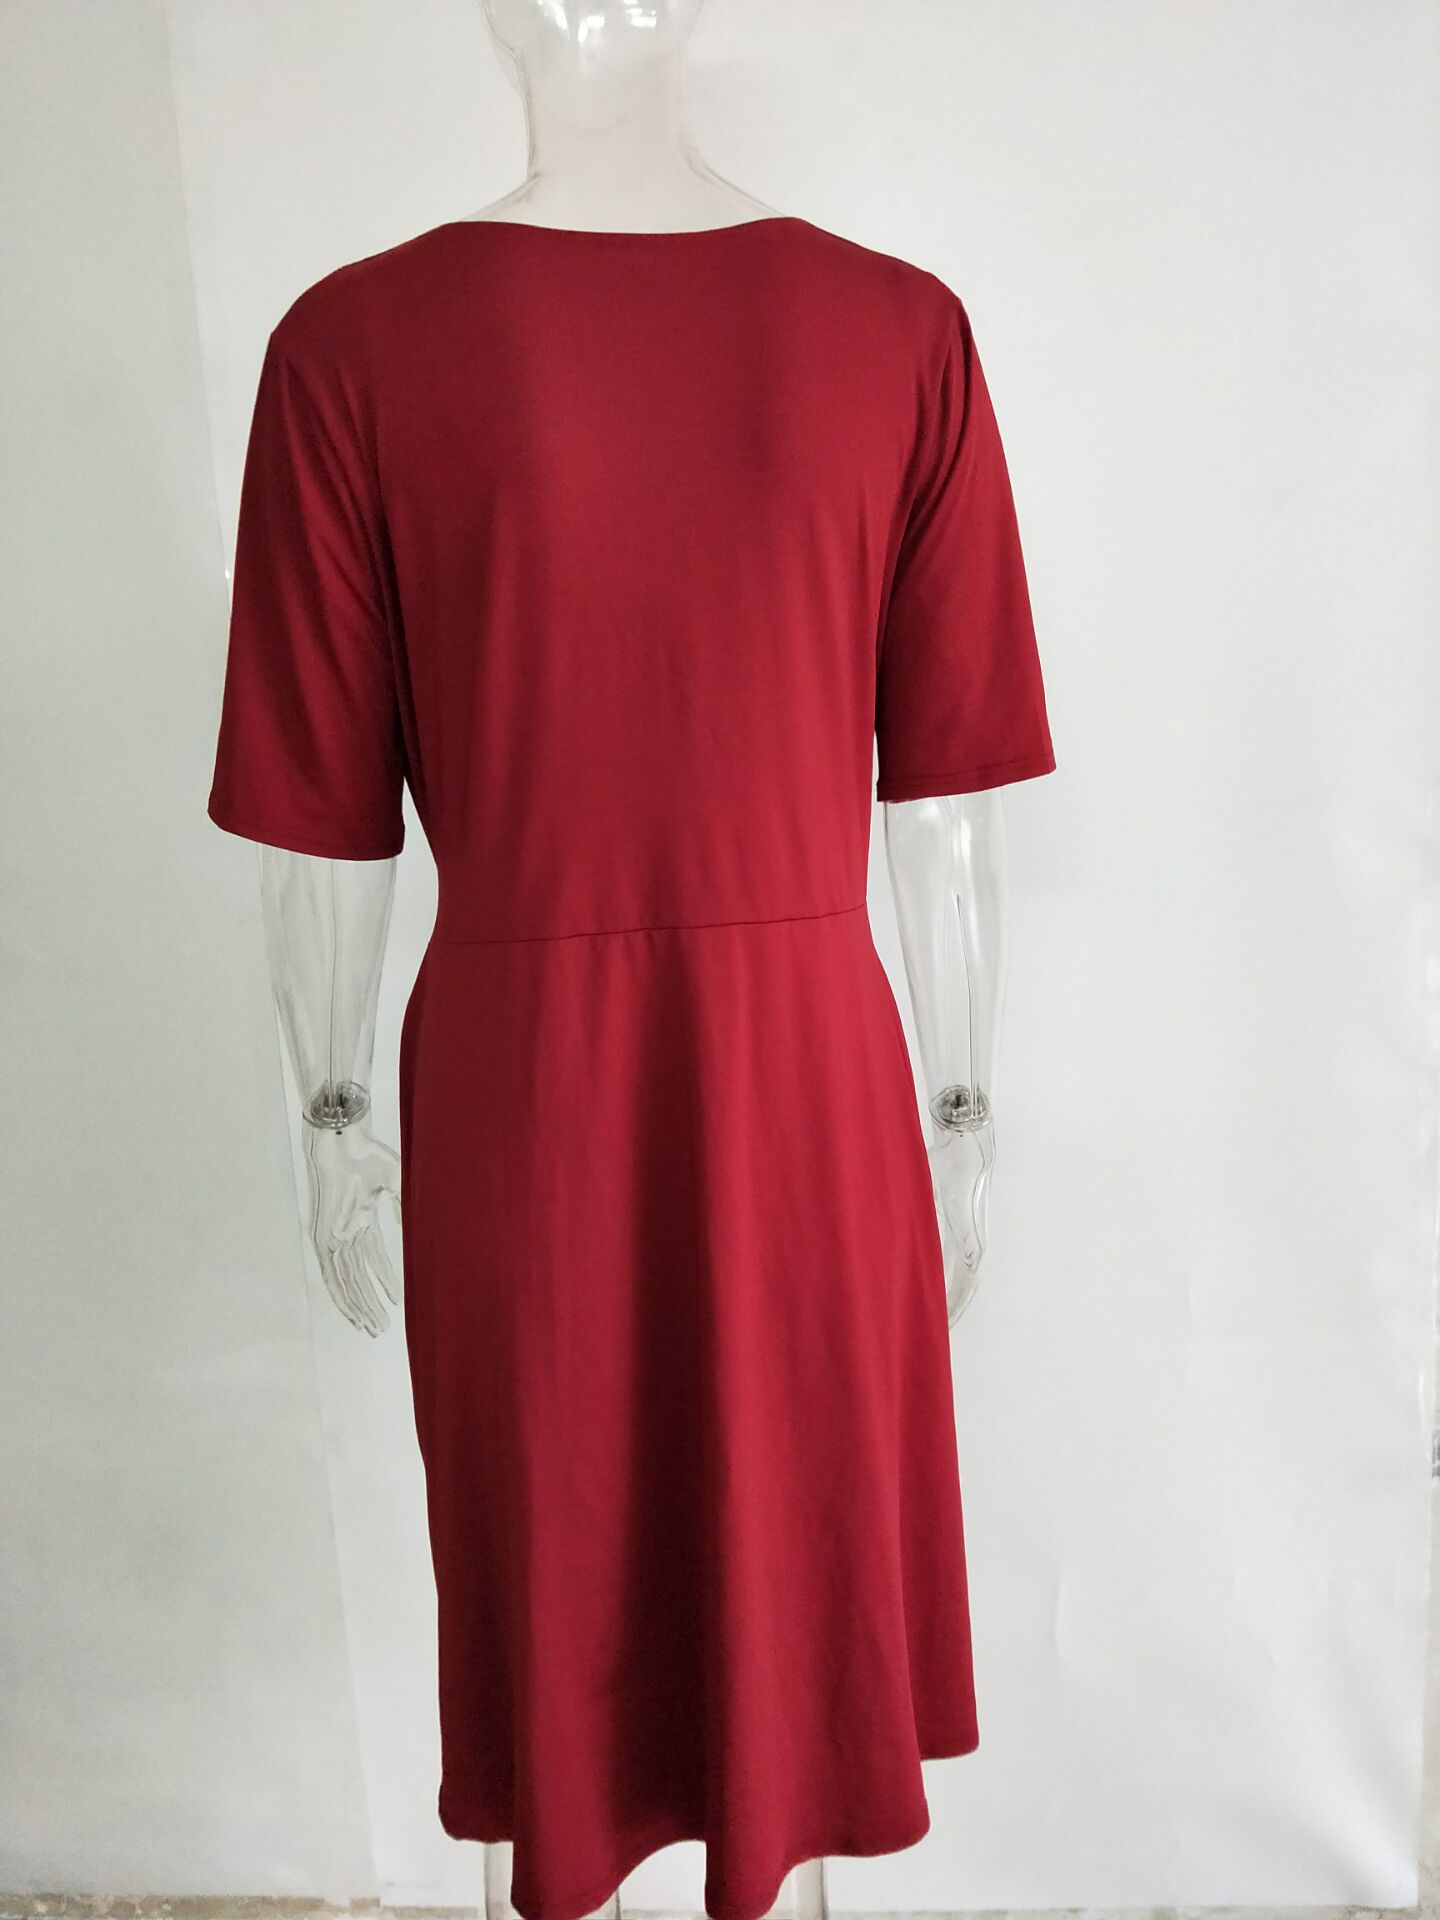 2021 V-neck Maternity Wrap Self-tie Waist Dress Breastfeeding Clothing Pregnant Casual Dress Robe Grossesse enlarge